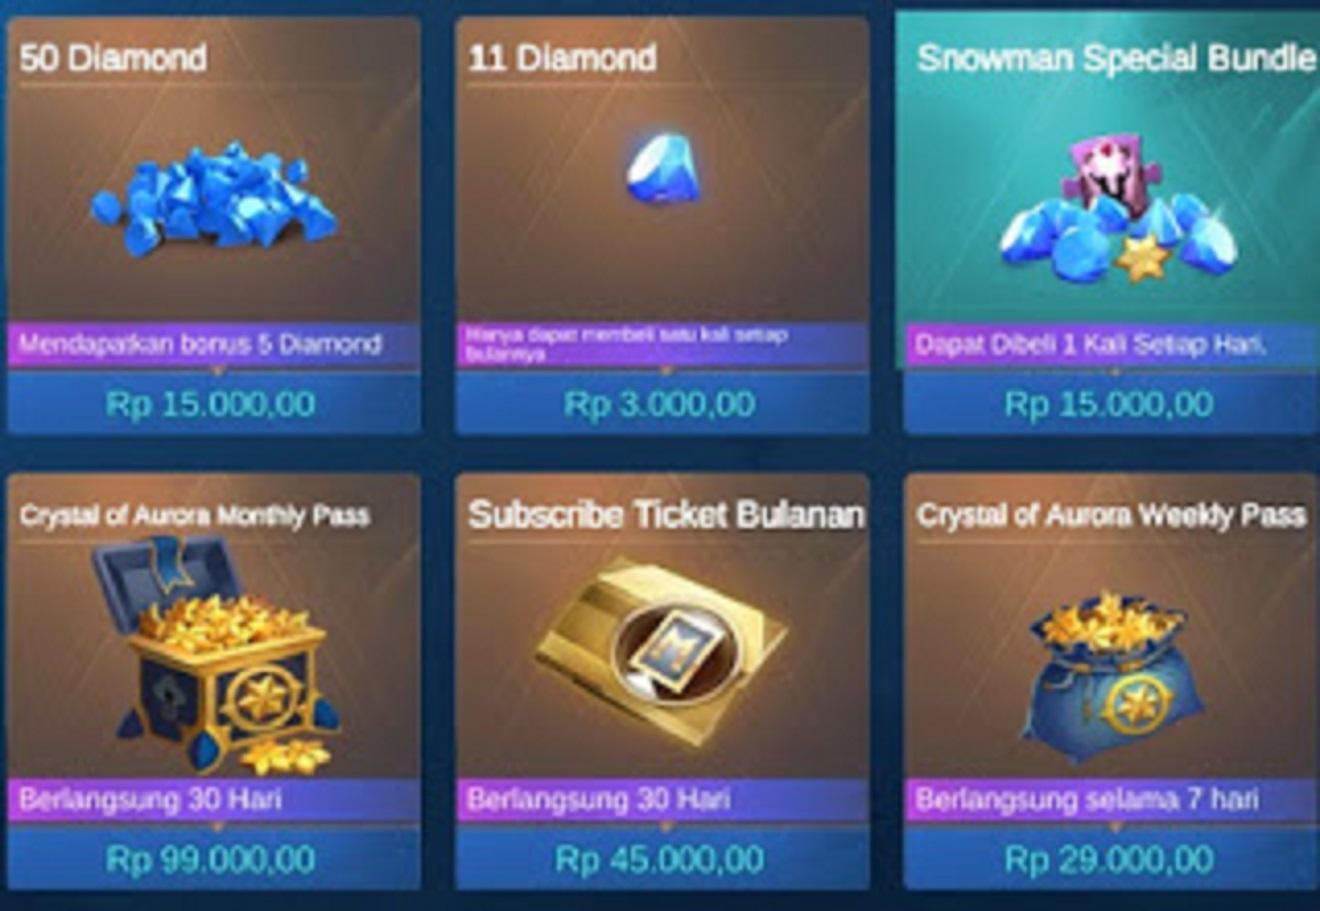 cara membeli diamond mobile legends